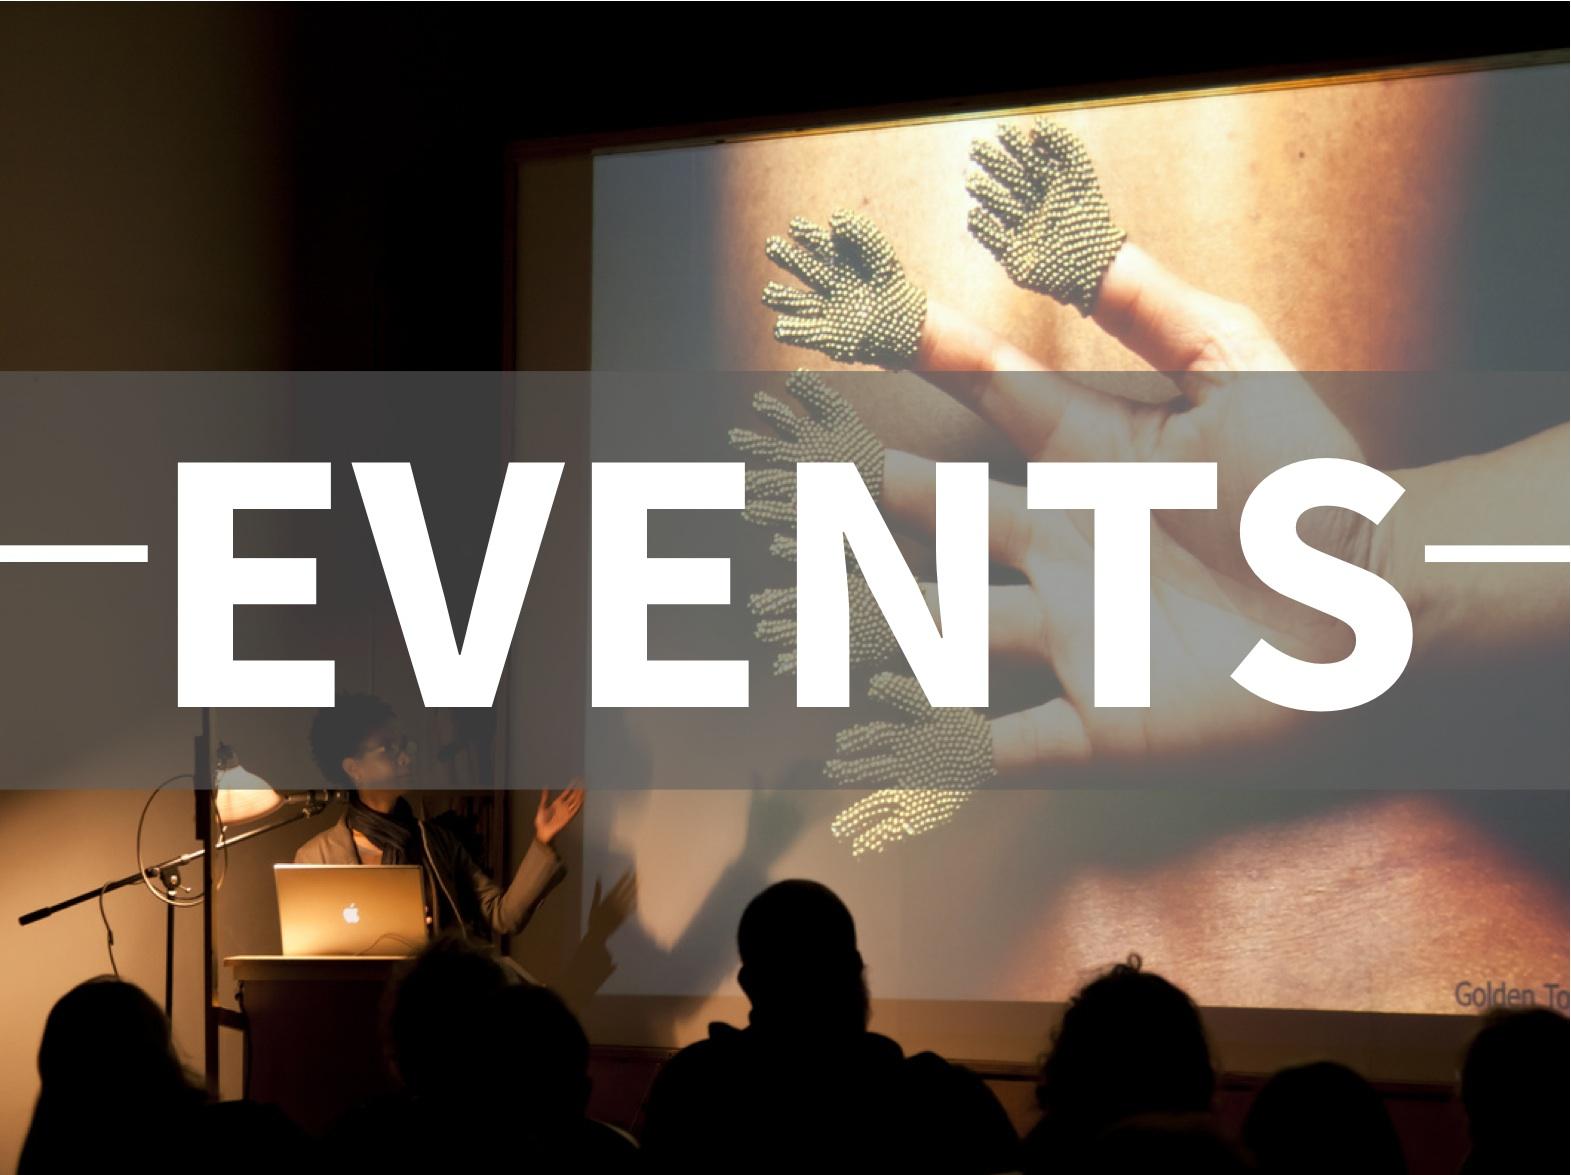 EVENTS B.jpg